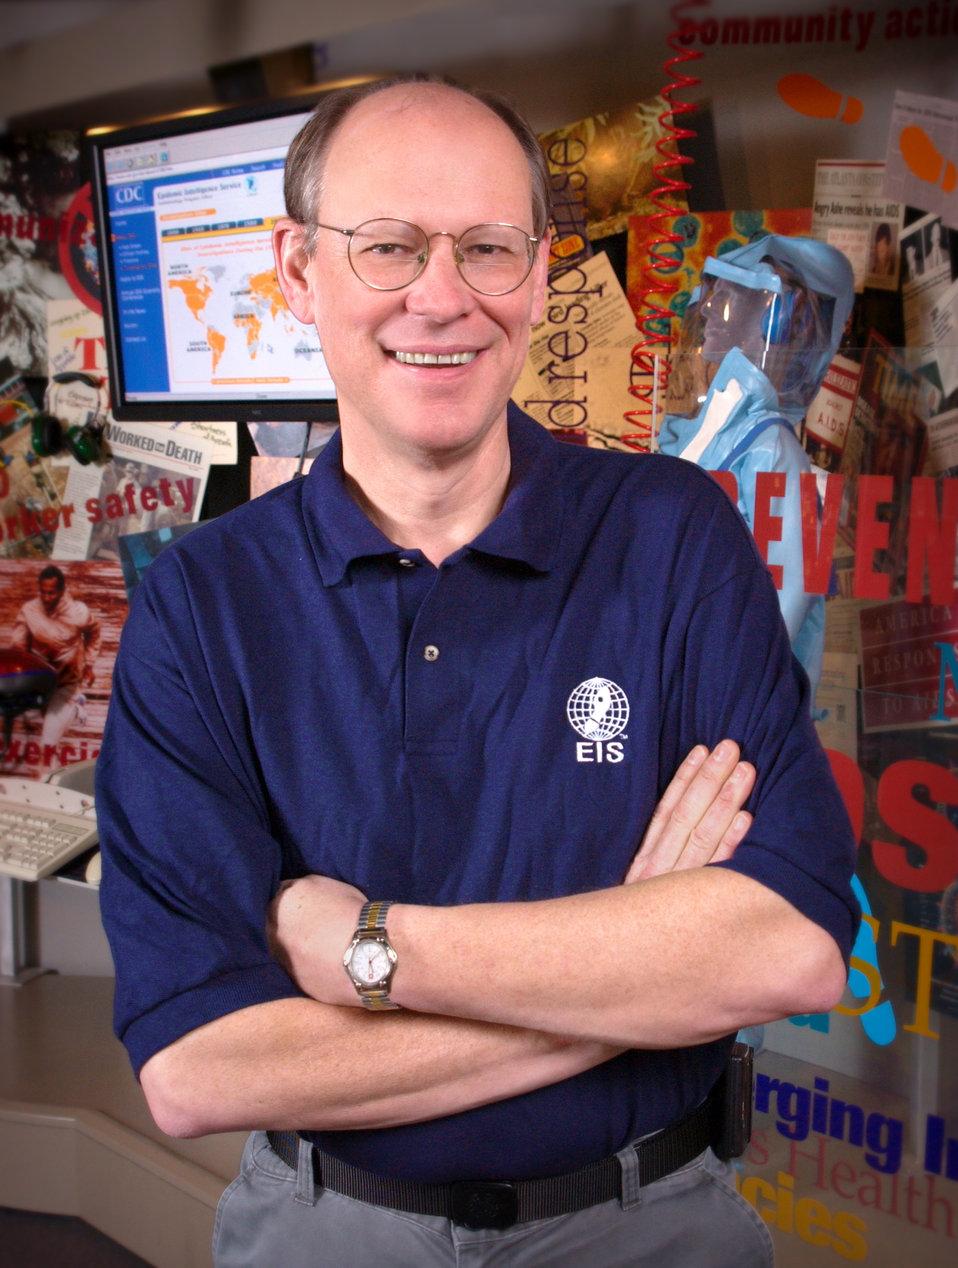 Douglas Hamilton, M.D., Ph.D., is the Dir. of the Epidemic Intelligence Service (EIS) Program.